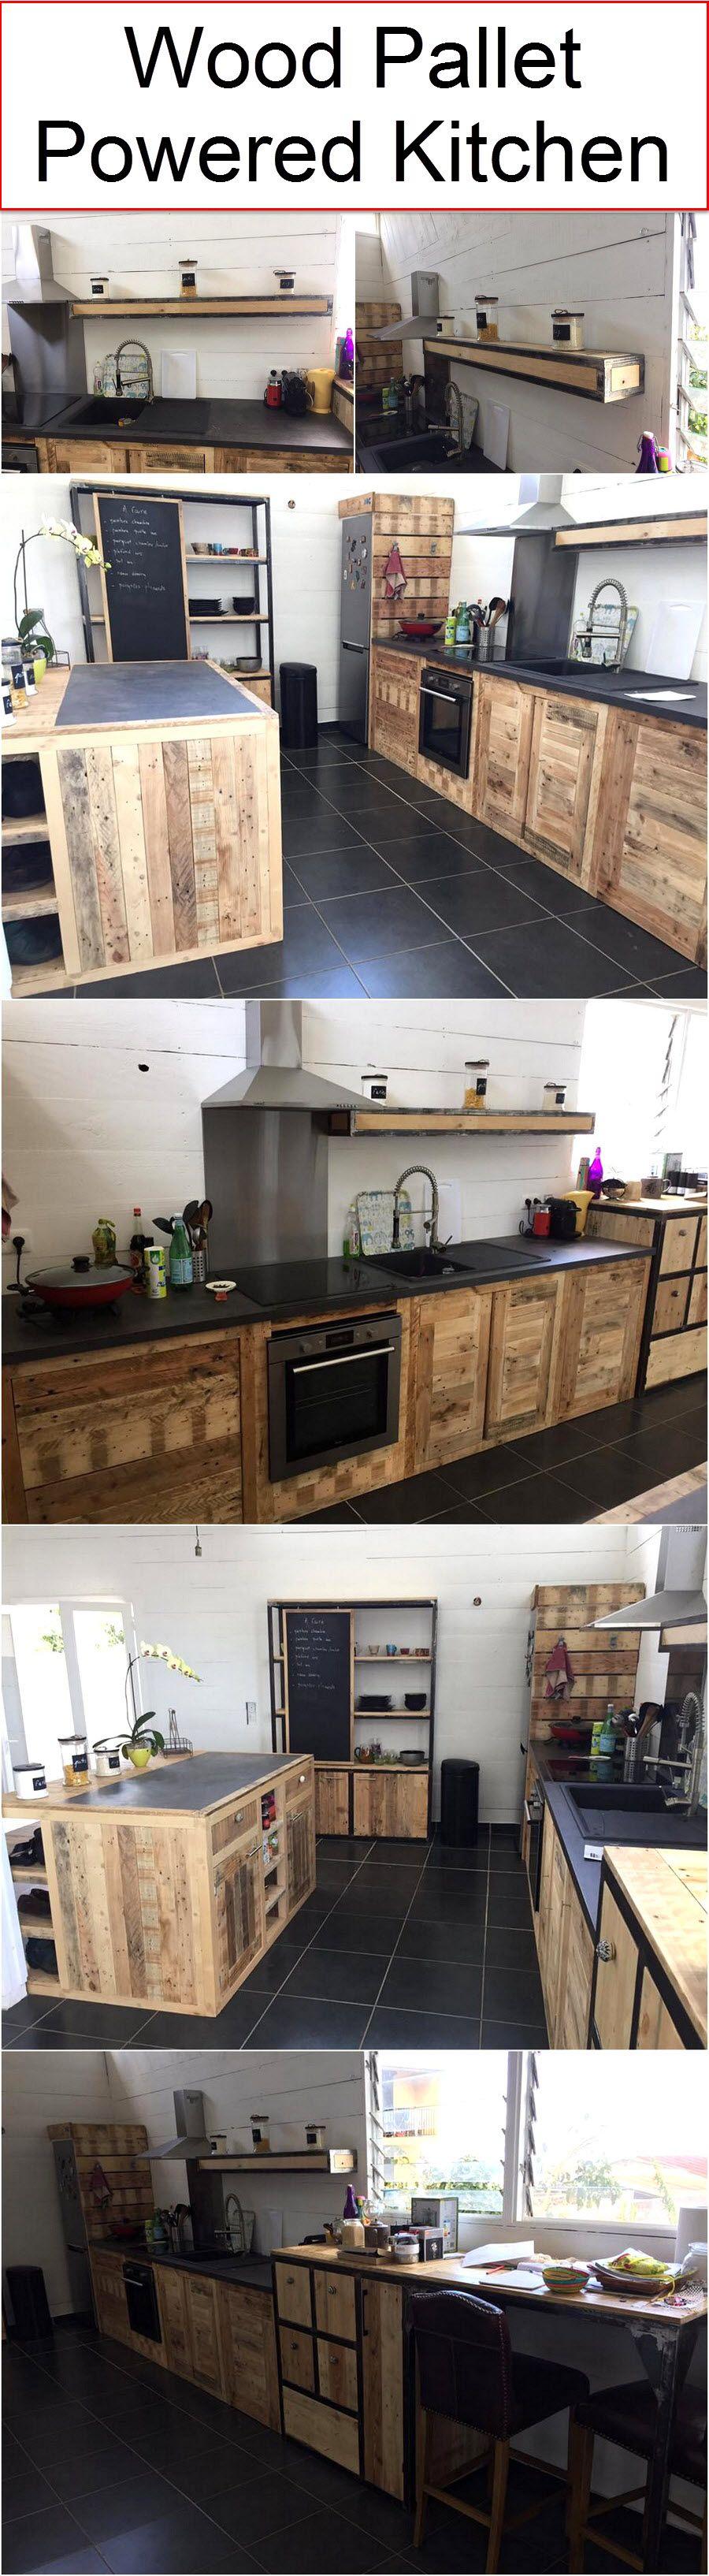 Wood Pallet Powered Kitchen Moveis De Paletes Cozinhas